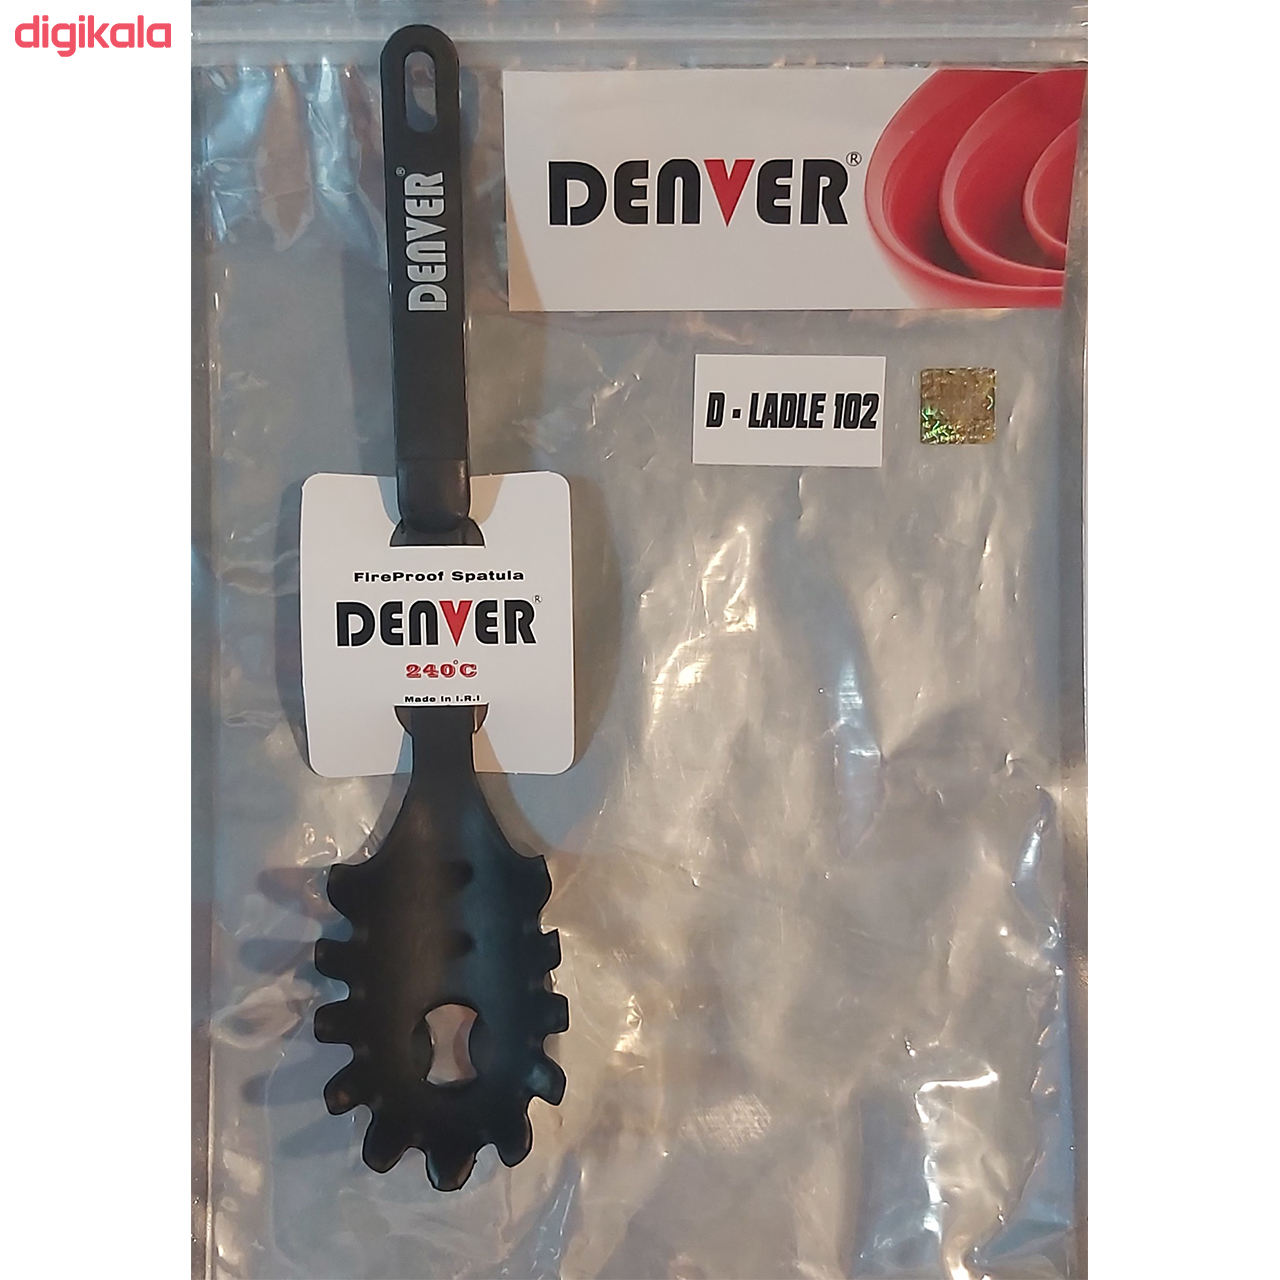 چنگال اسپاگتی دنور مدل D-LADLE 102 main 1 2